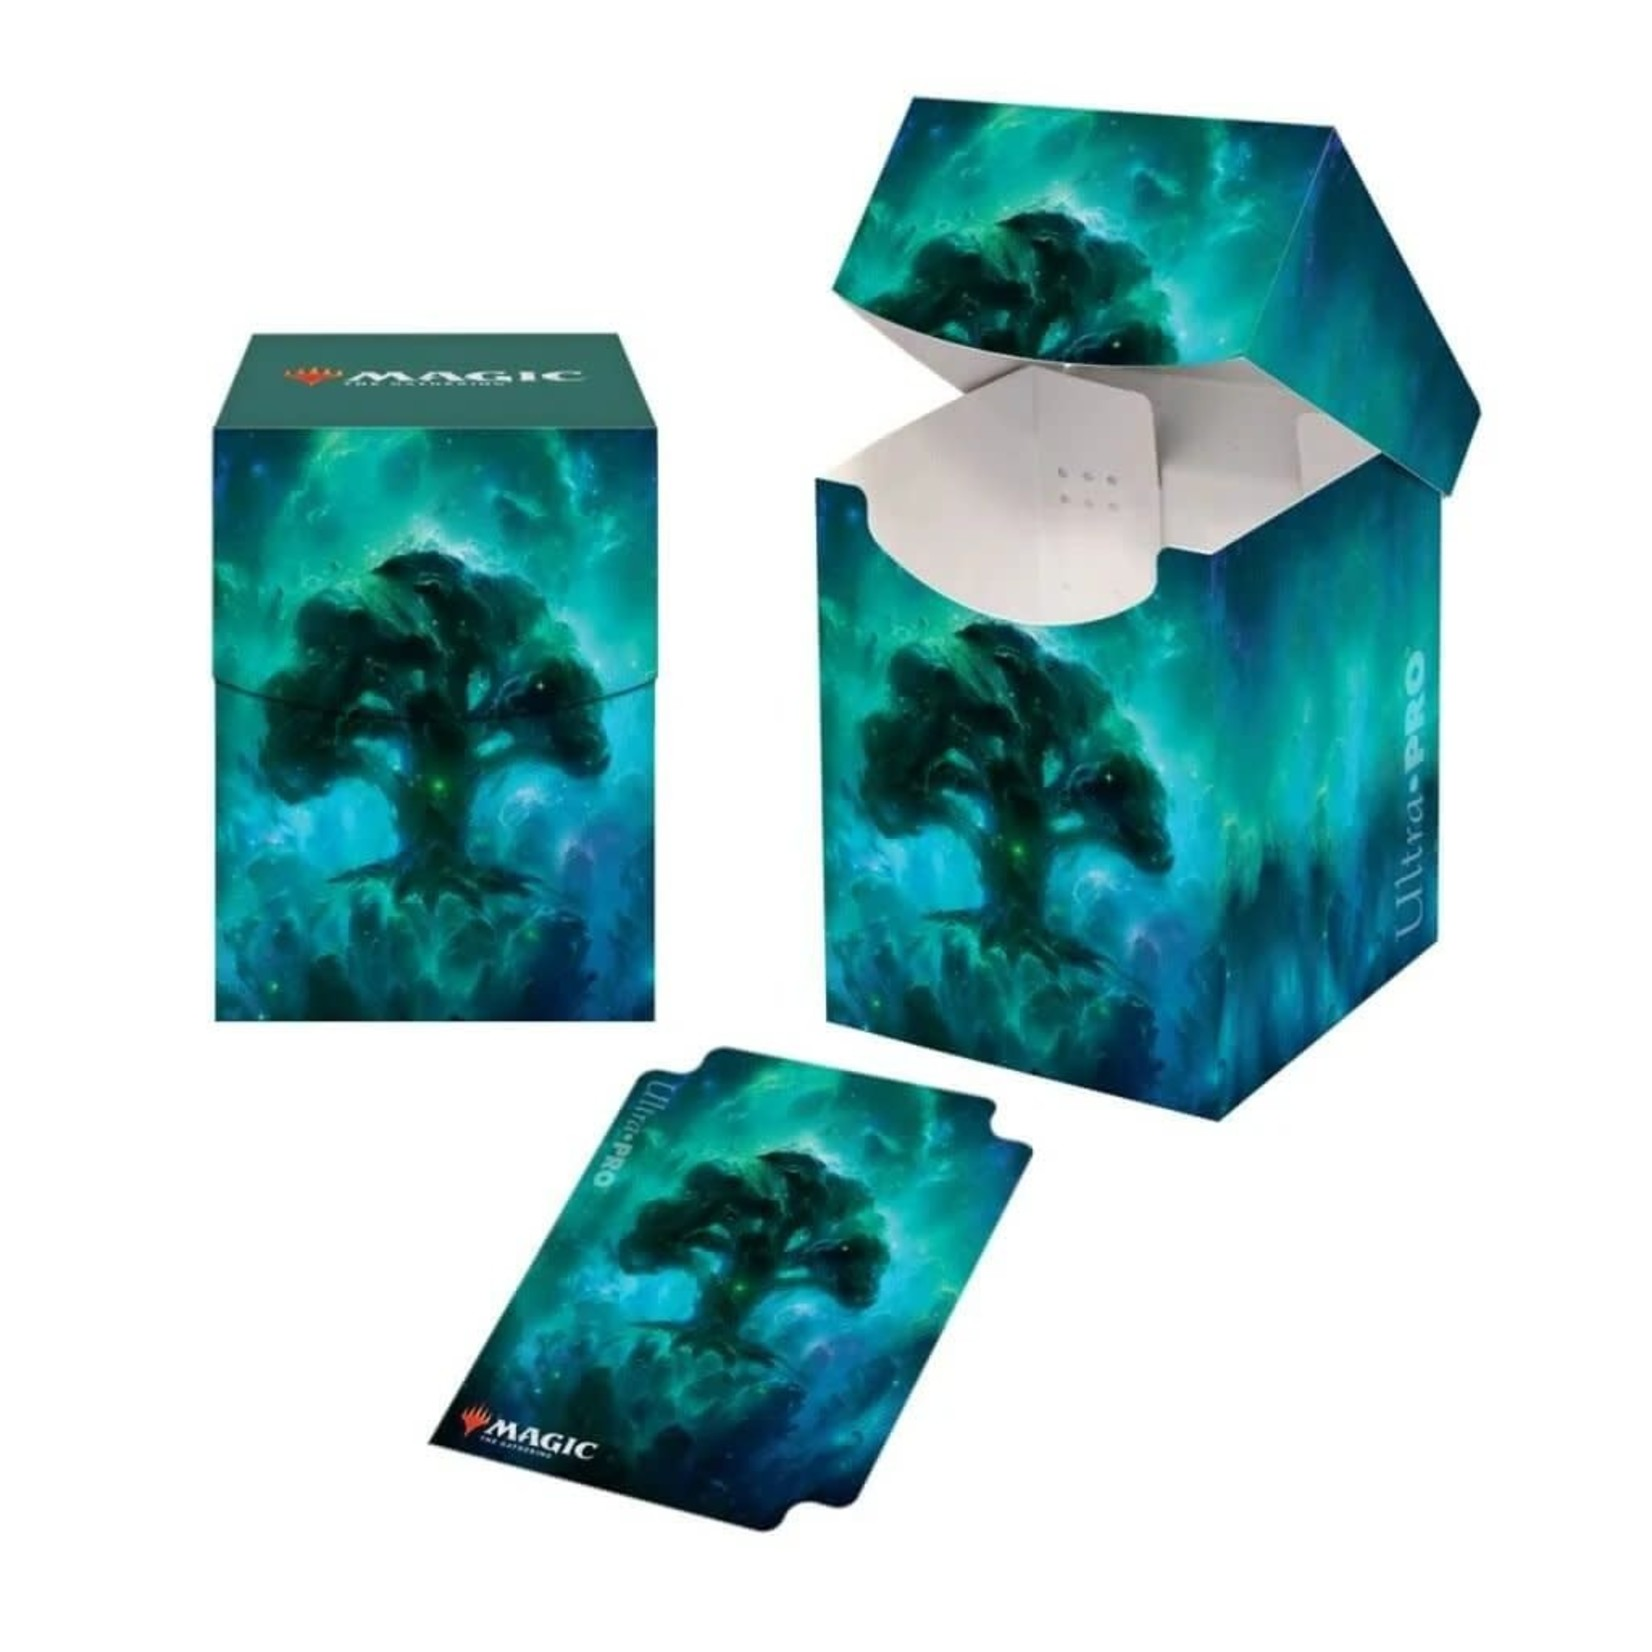 Ultra Pro Ultra Pro Deck Box: PRO 100+ MtG Celestial Forest